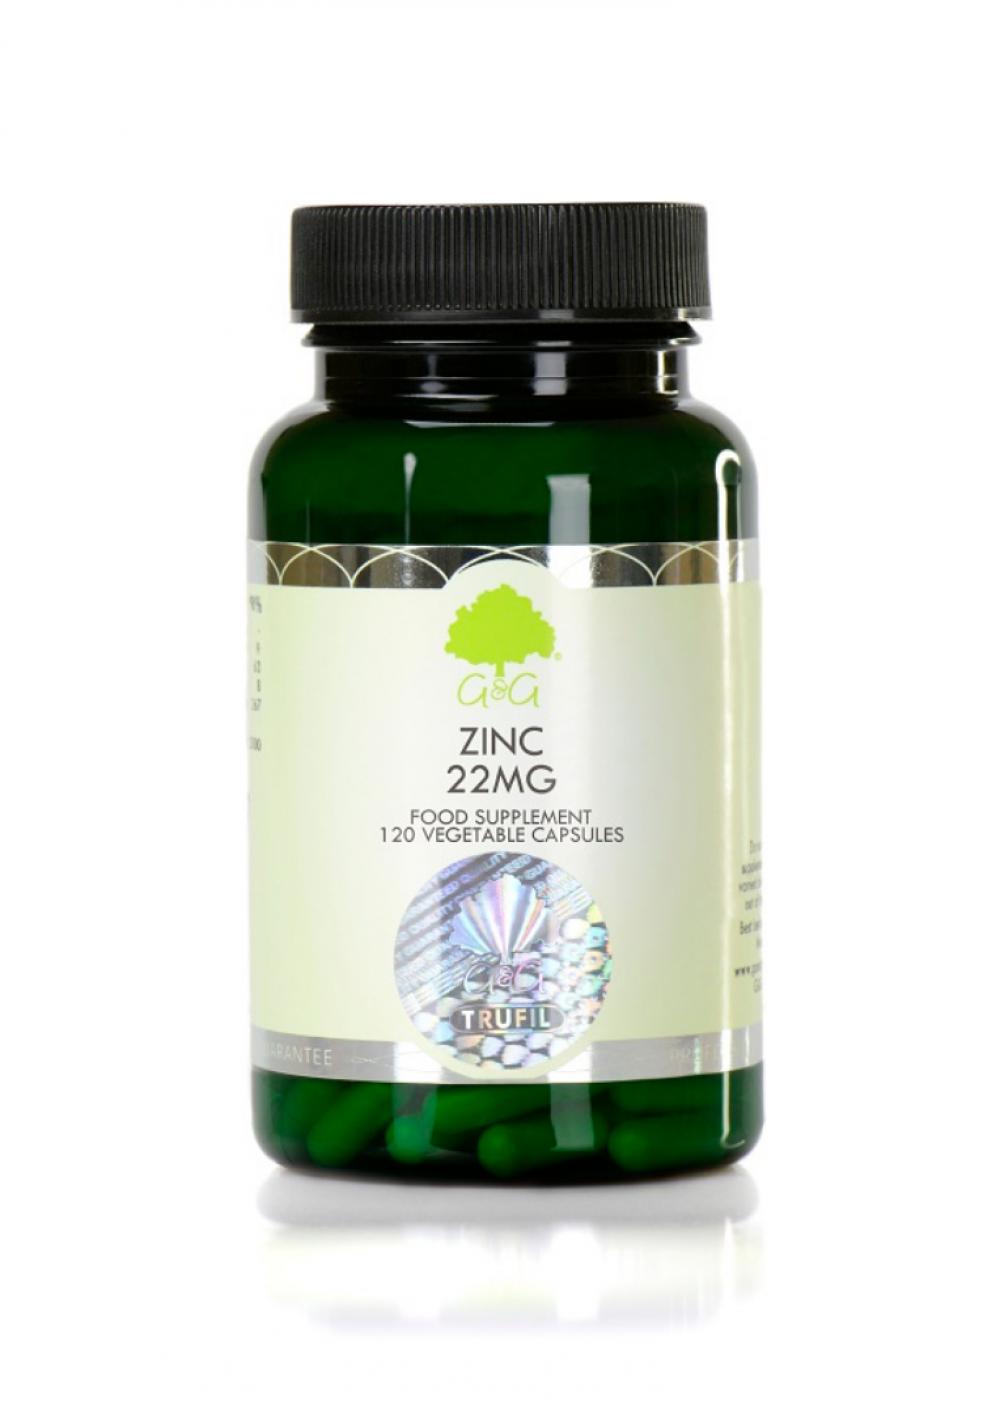 G&G Vitamins Zinc Picolinate 22mg (Zink) 120 veg. Kapseln (21,6g) (vegan)